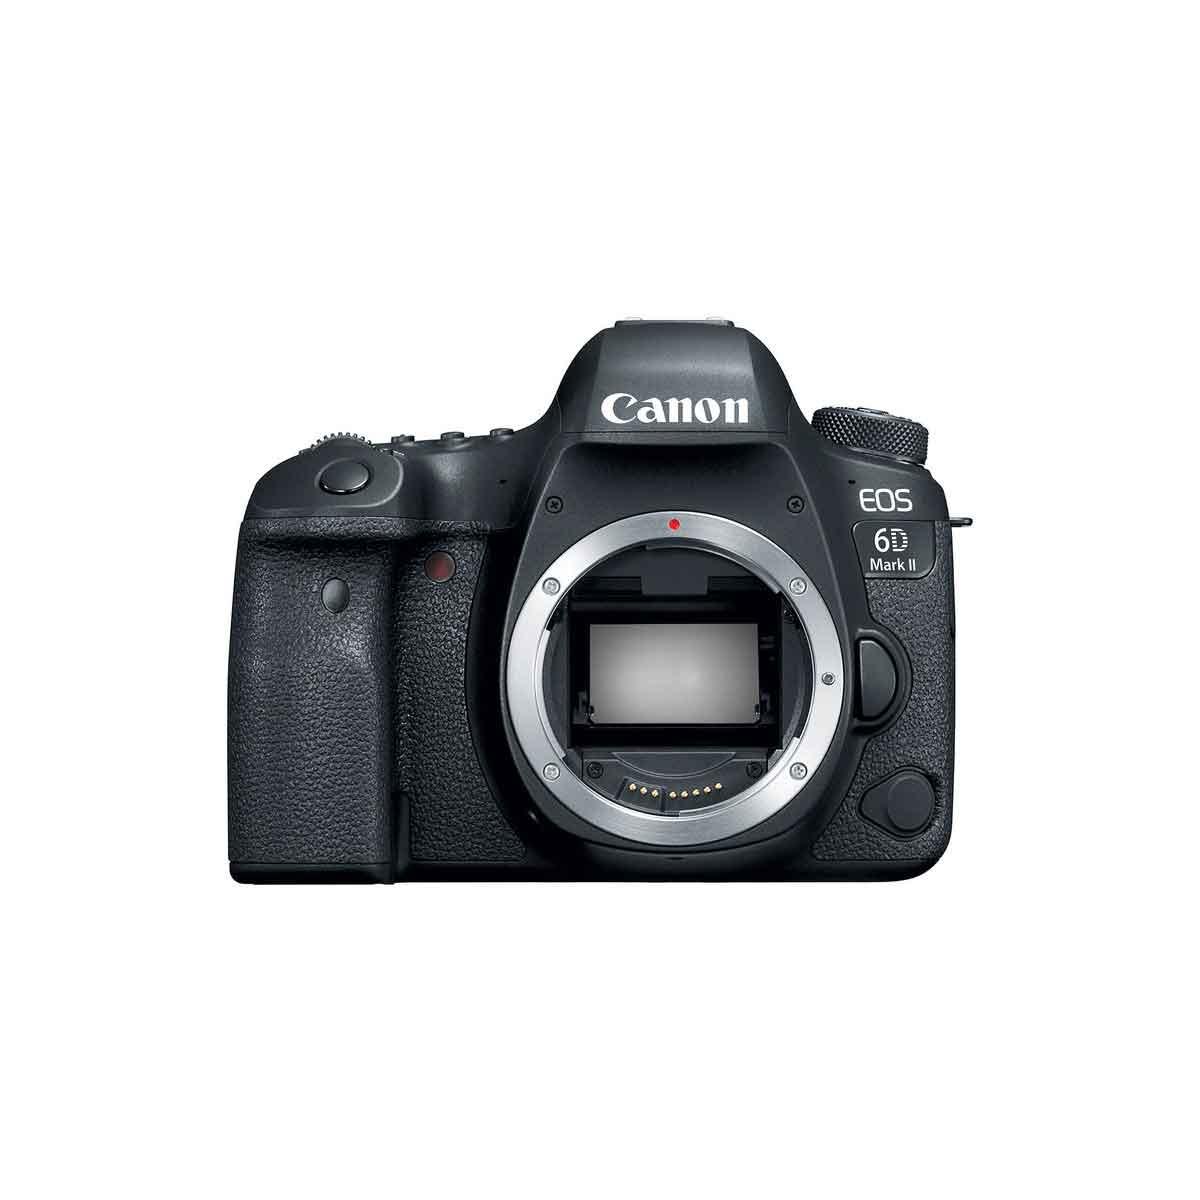 Canon Eos 6d Mark Ii Dslr Body The Camera Exchange Inc